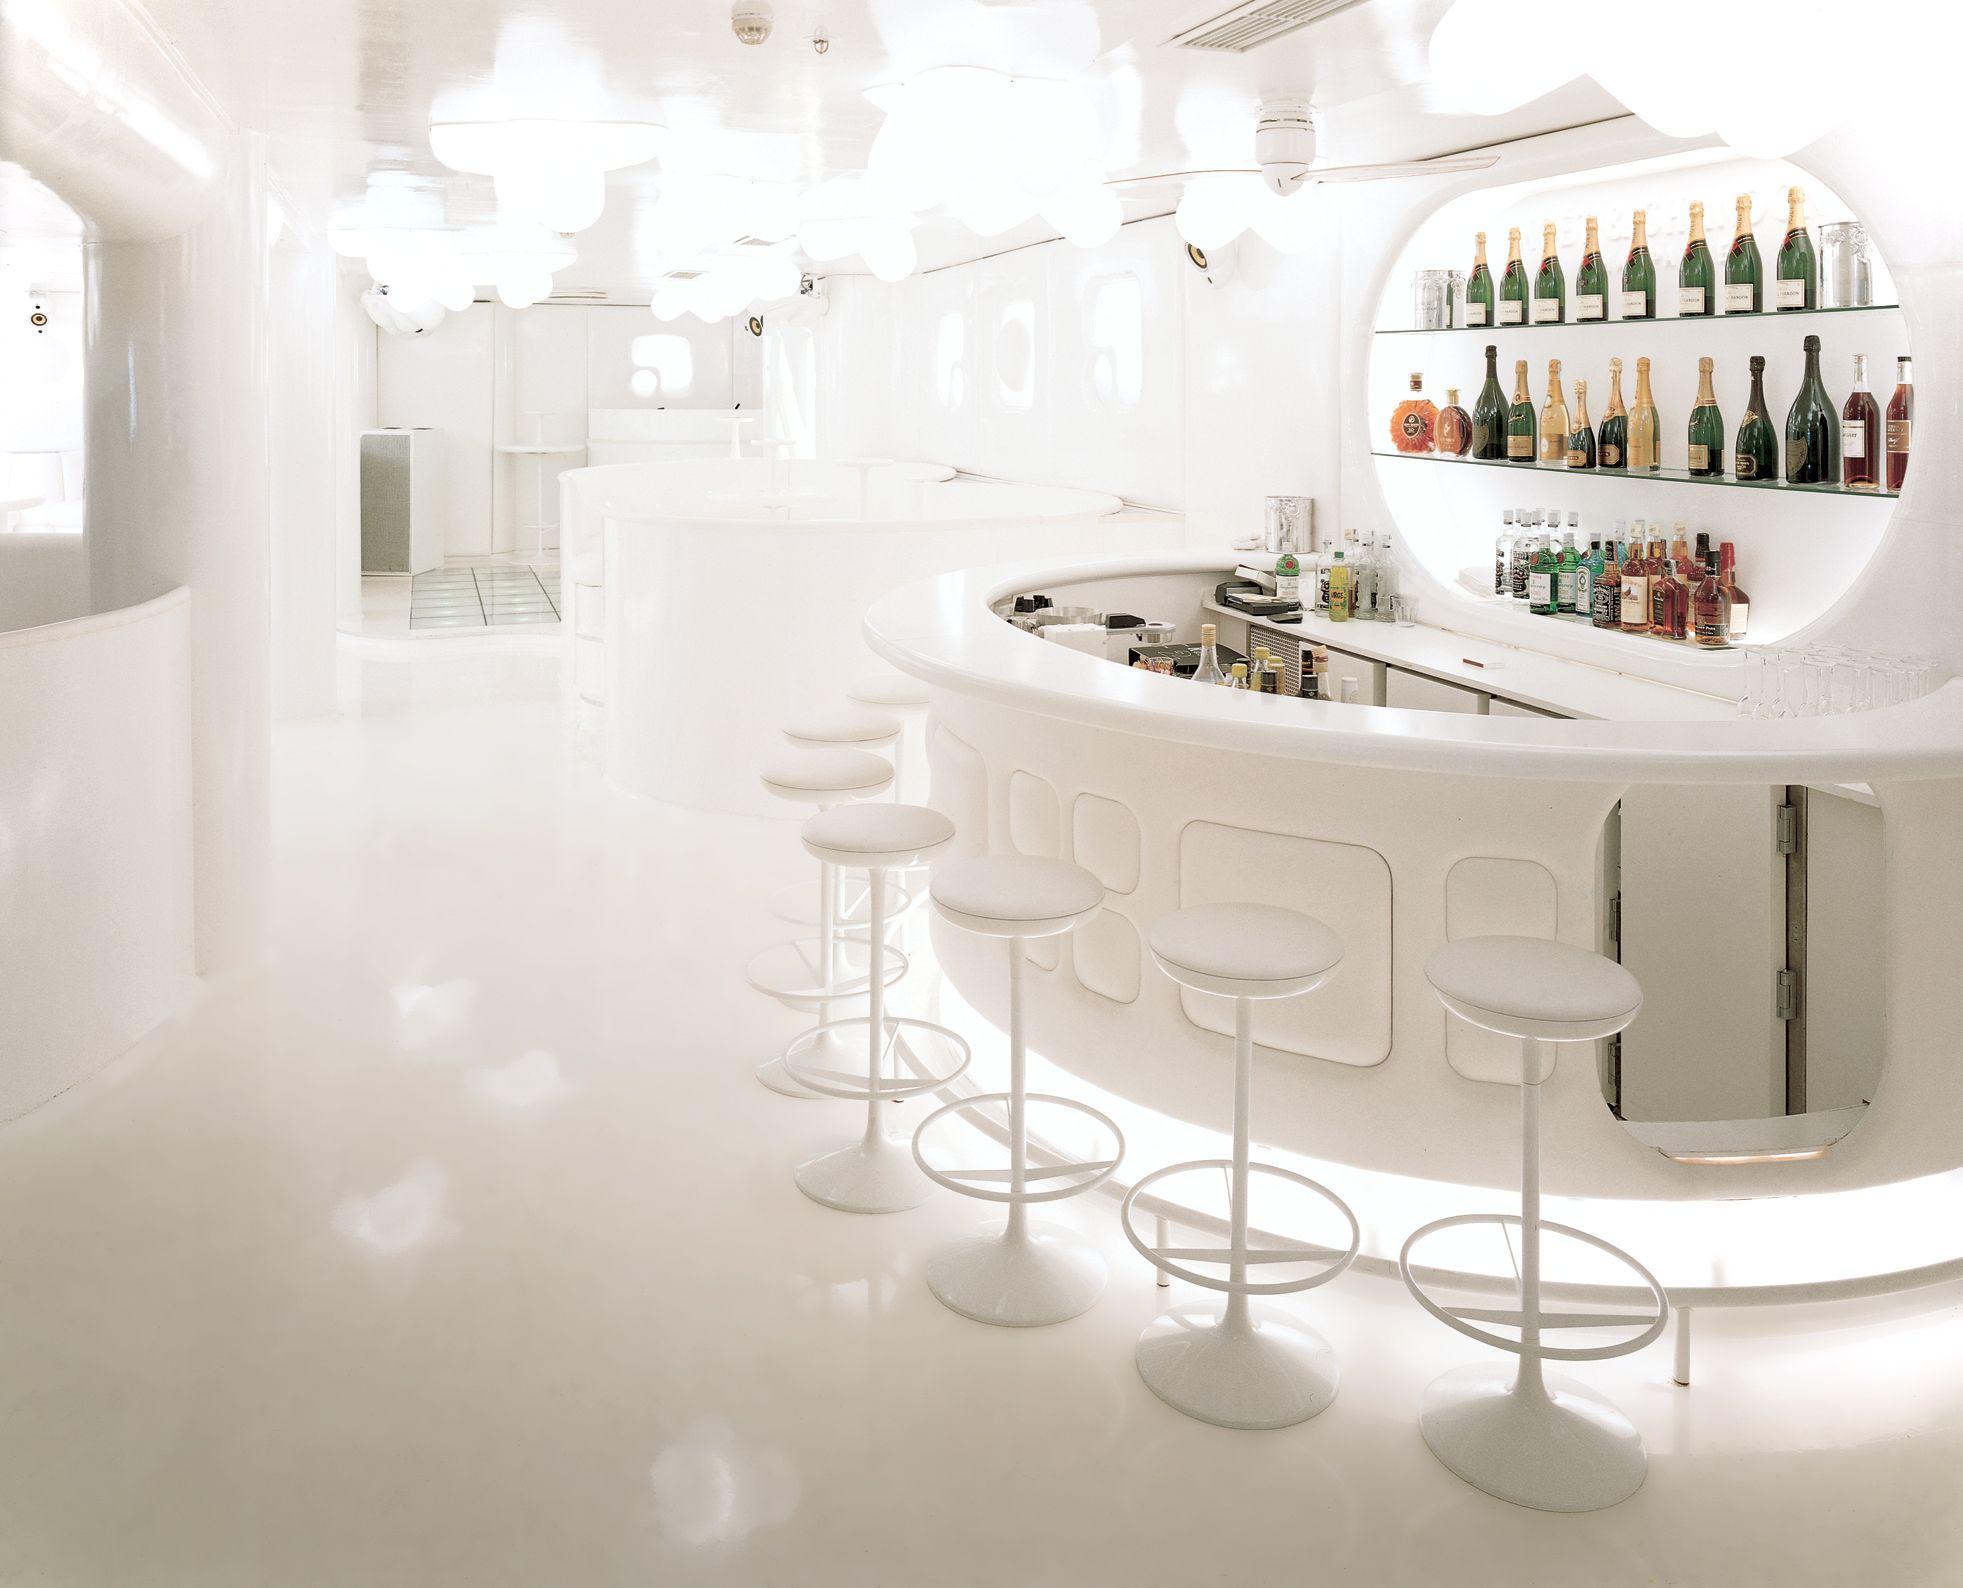 Nasa Nightclub Entertainment Design With Images Nightclub